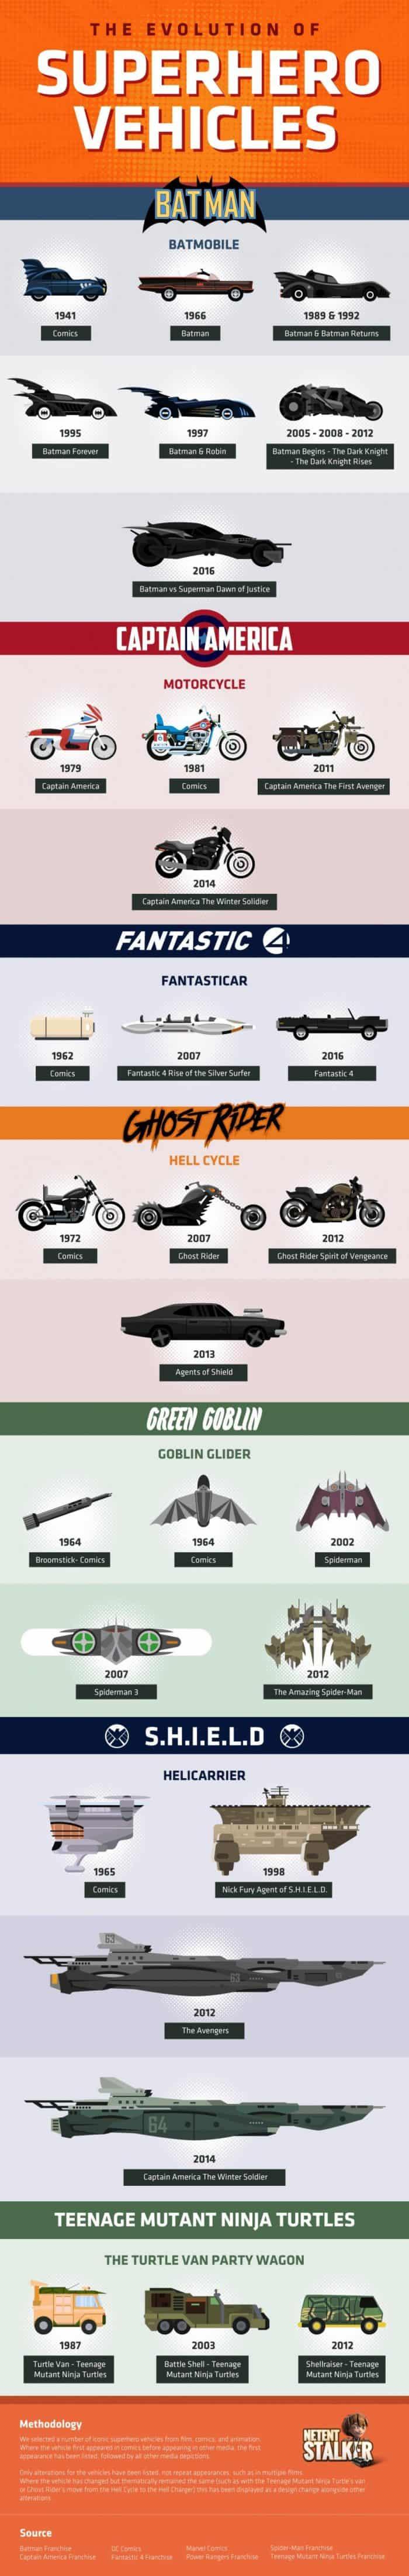 evolution of superhero vehicles